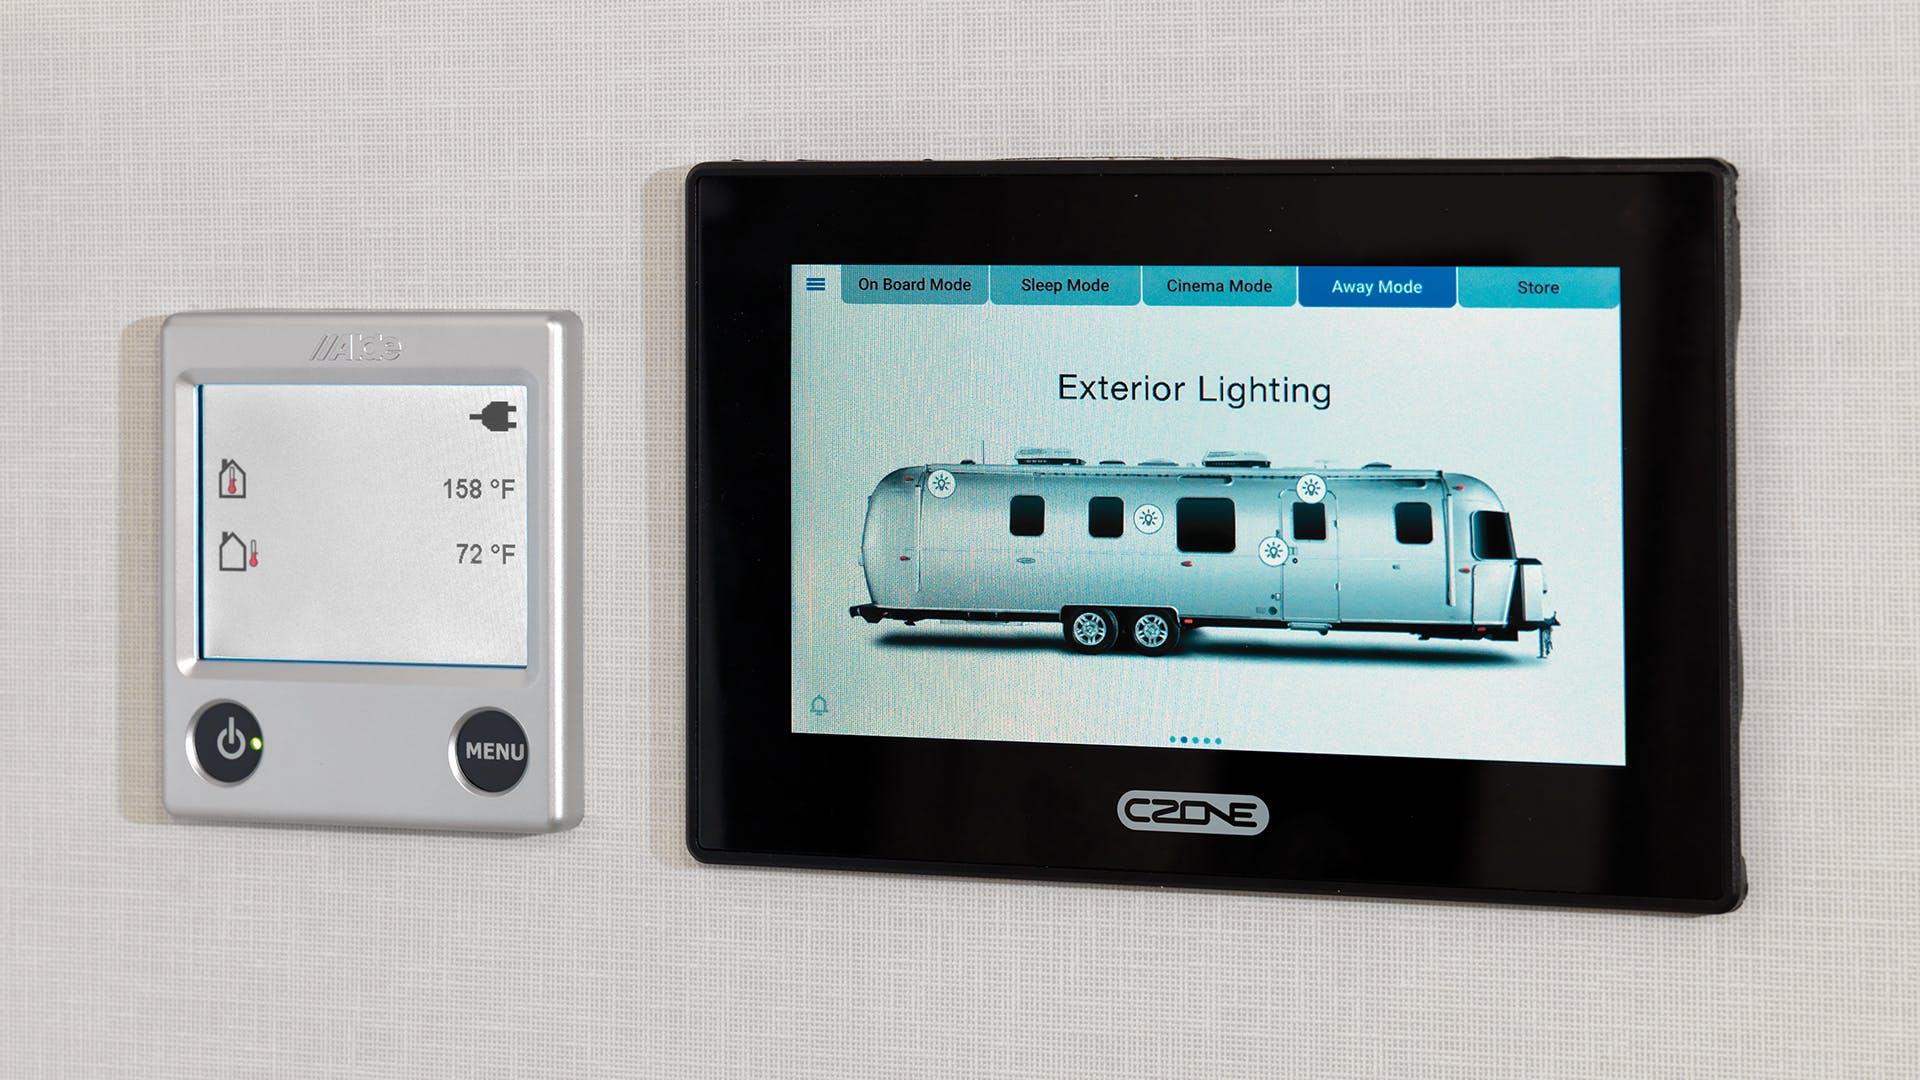 Airstream-Classic-Smart-Control-Technology-cZone-Panel-Exterior-Light-Control